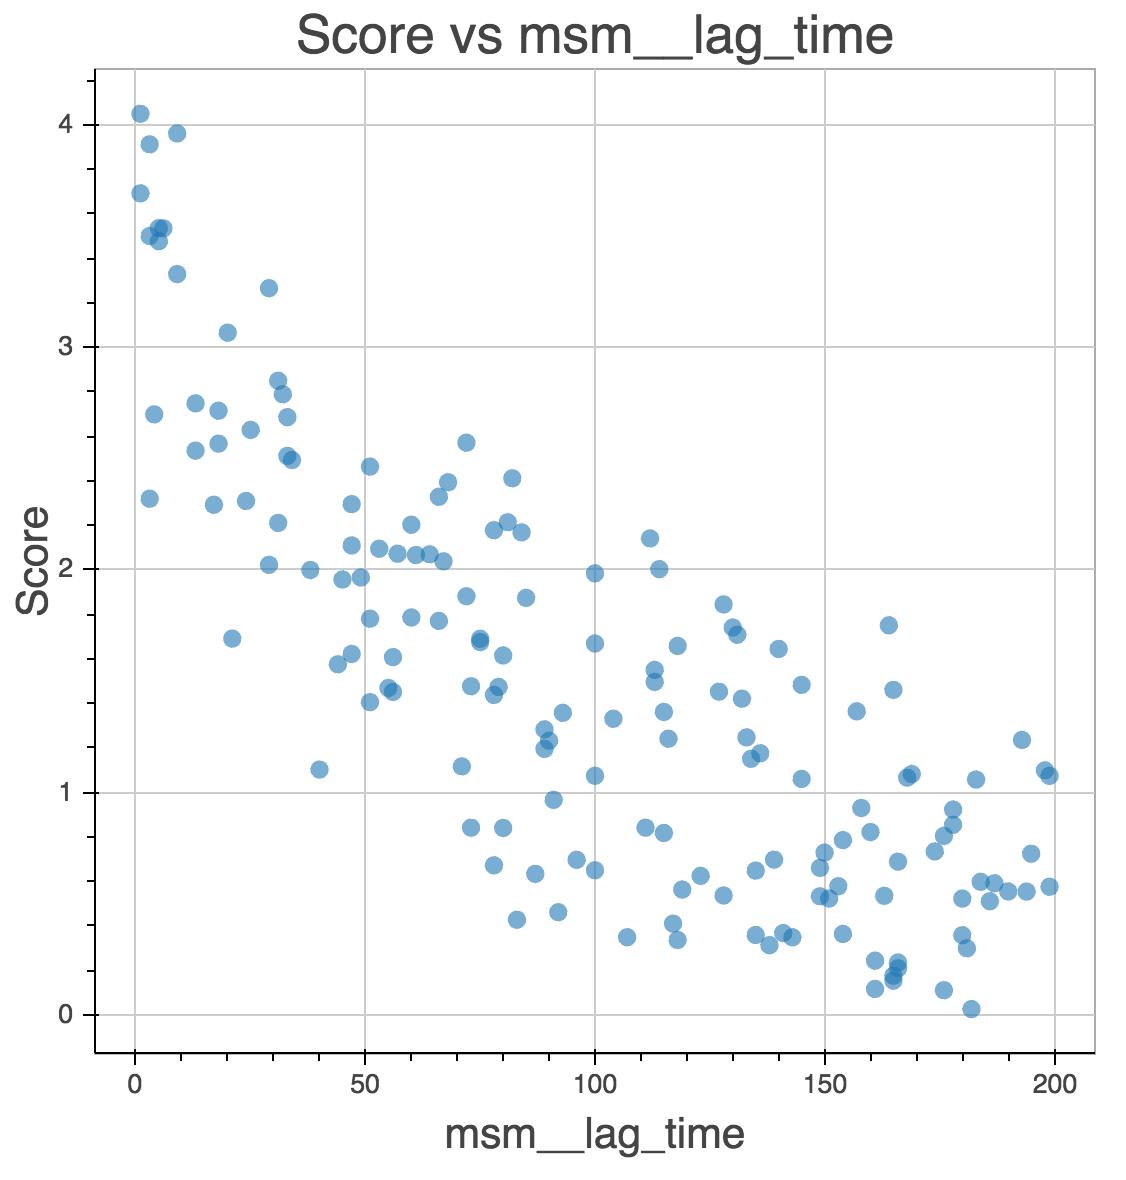 gmrq decreases